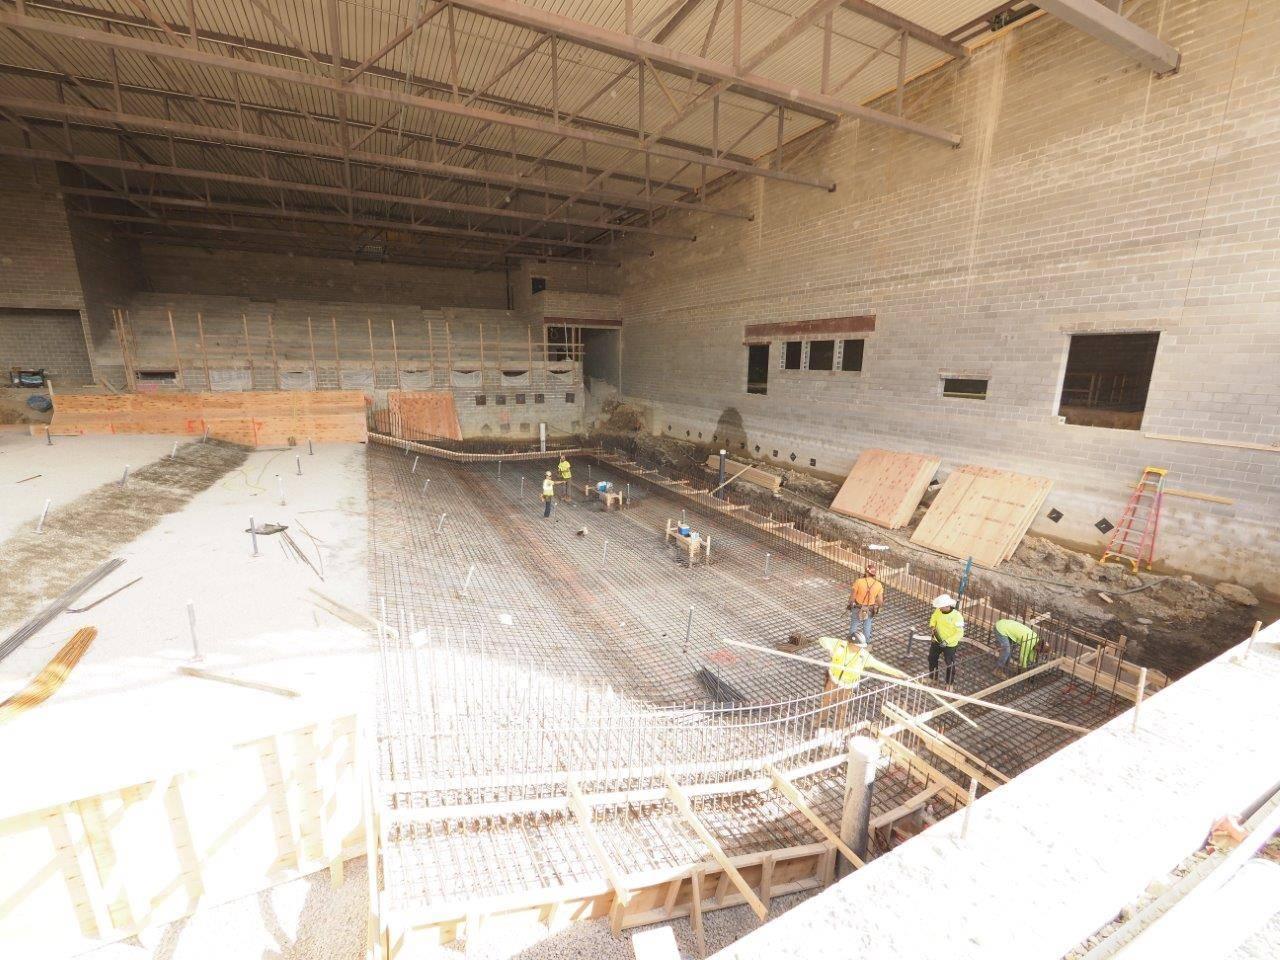 Inside the new high school natatorium